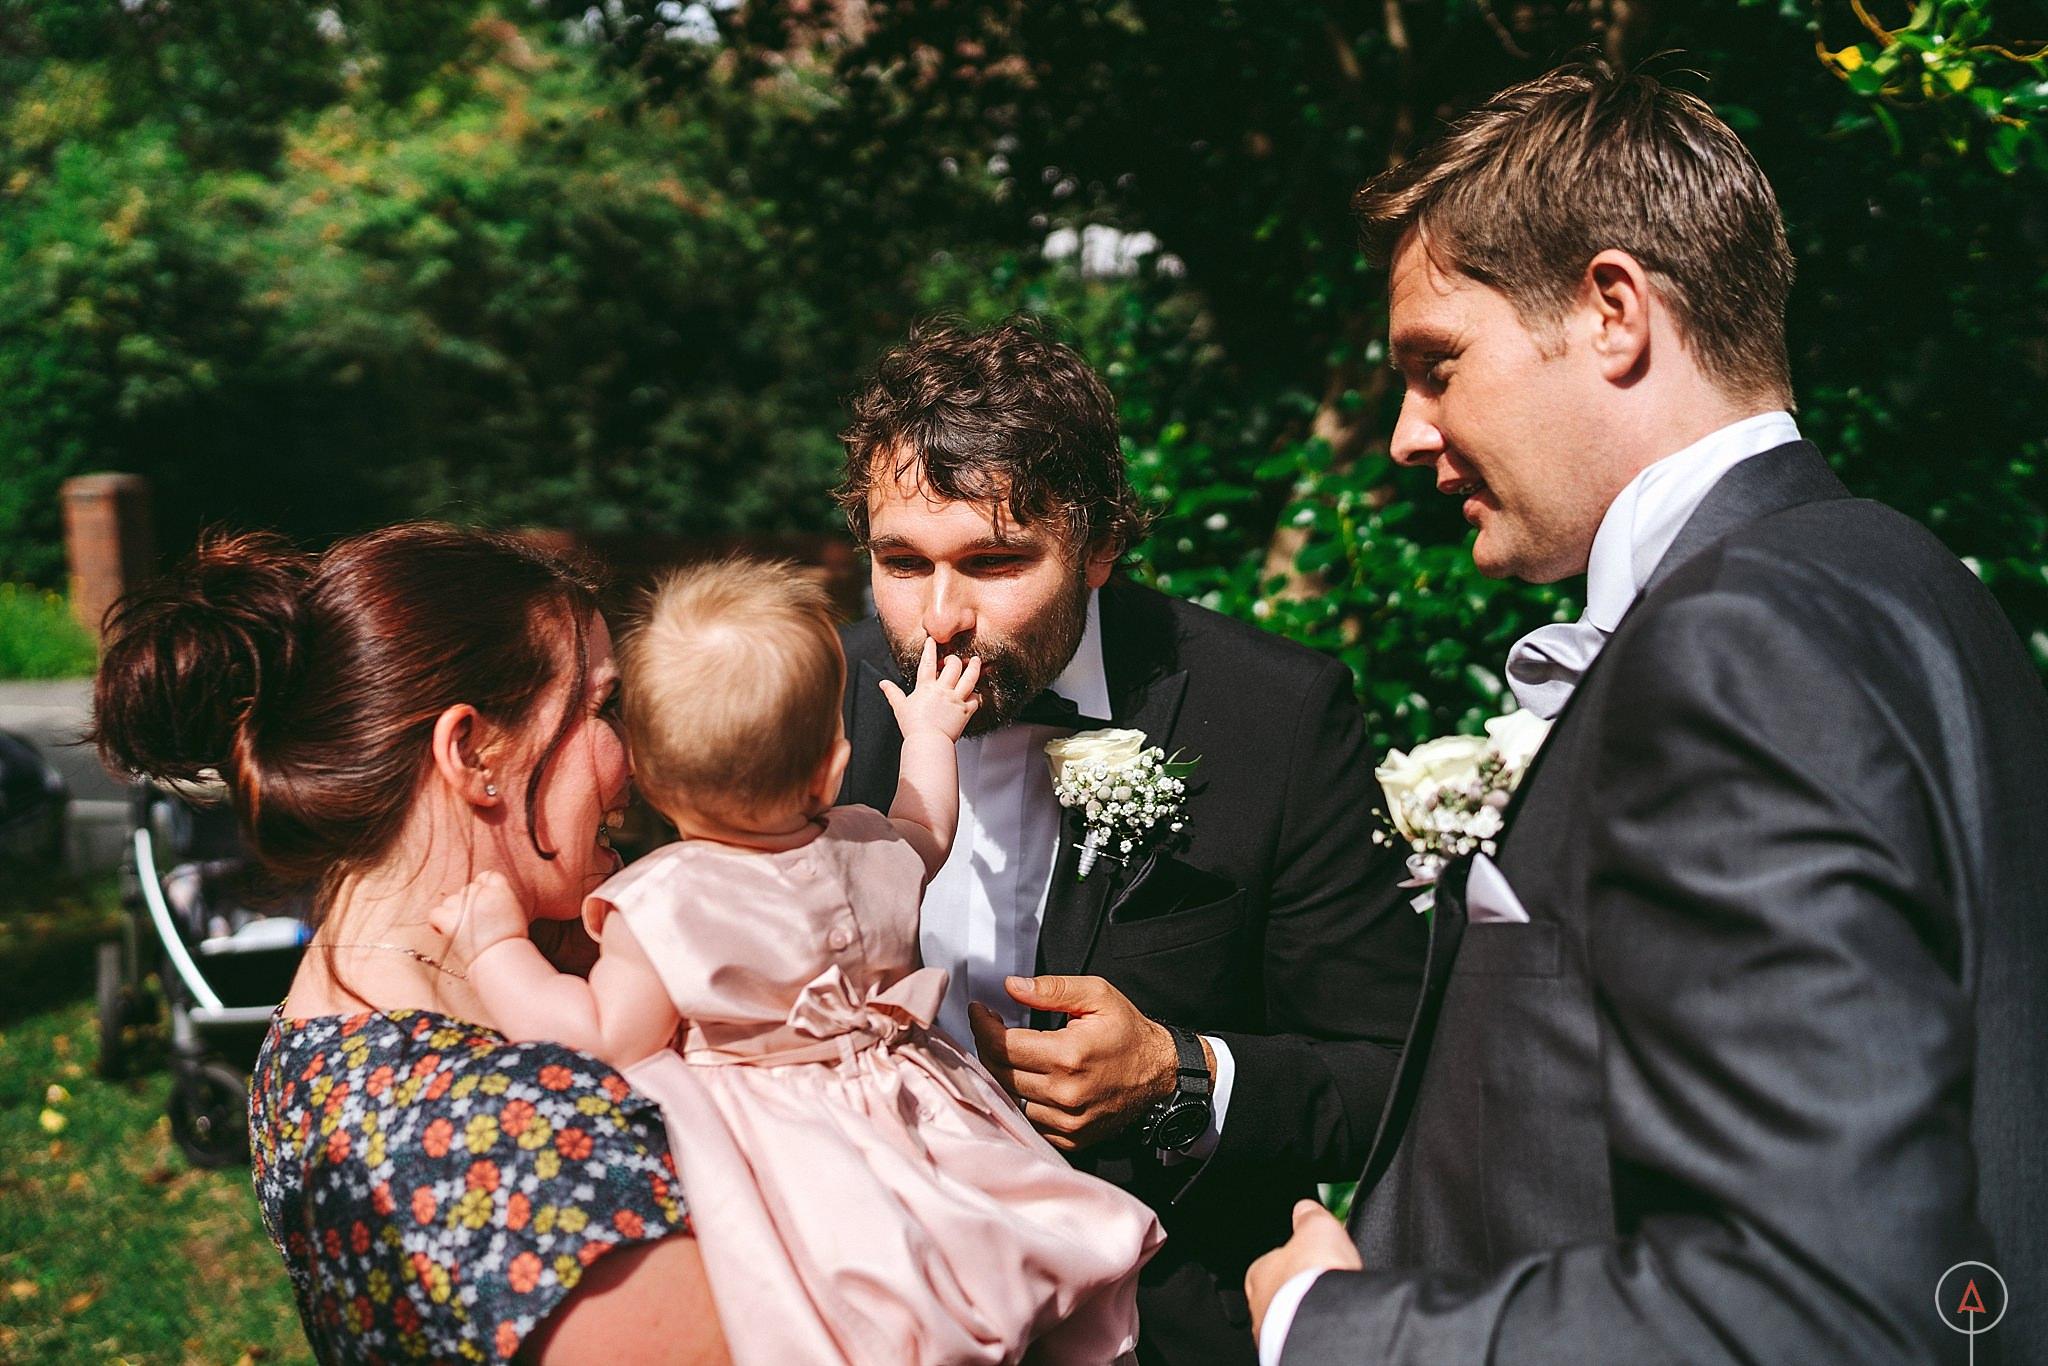 cardiff-wedding-photographer-aga-tomaszek_0375